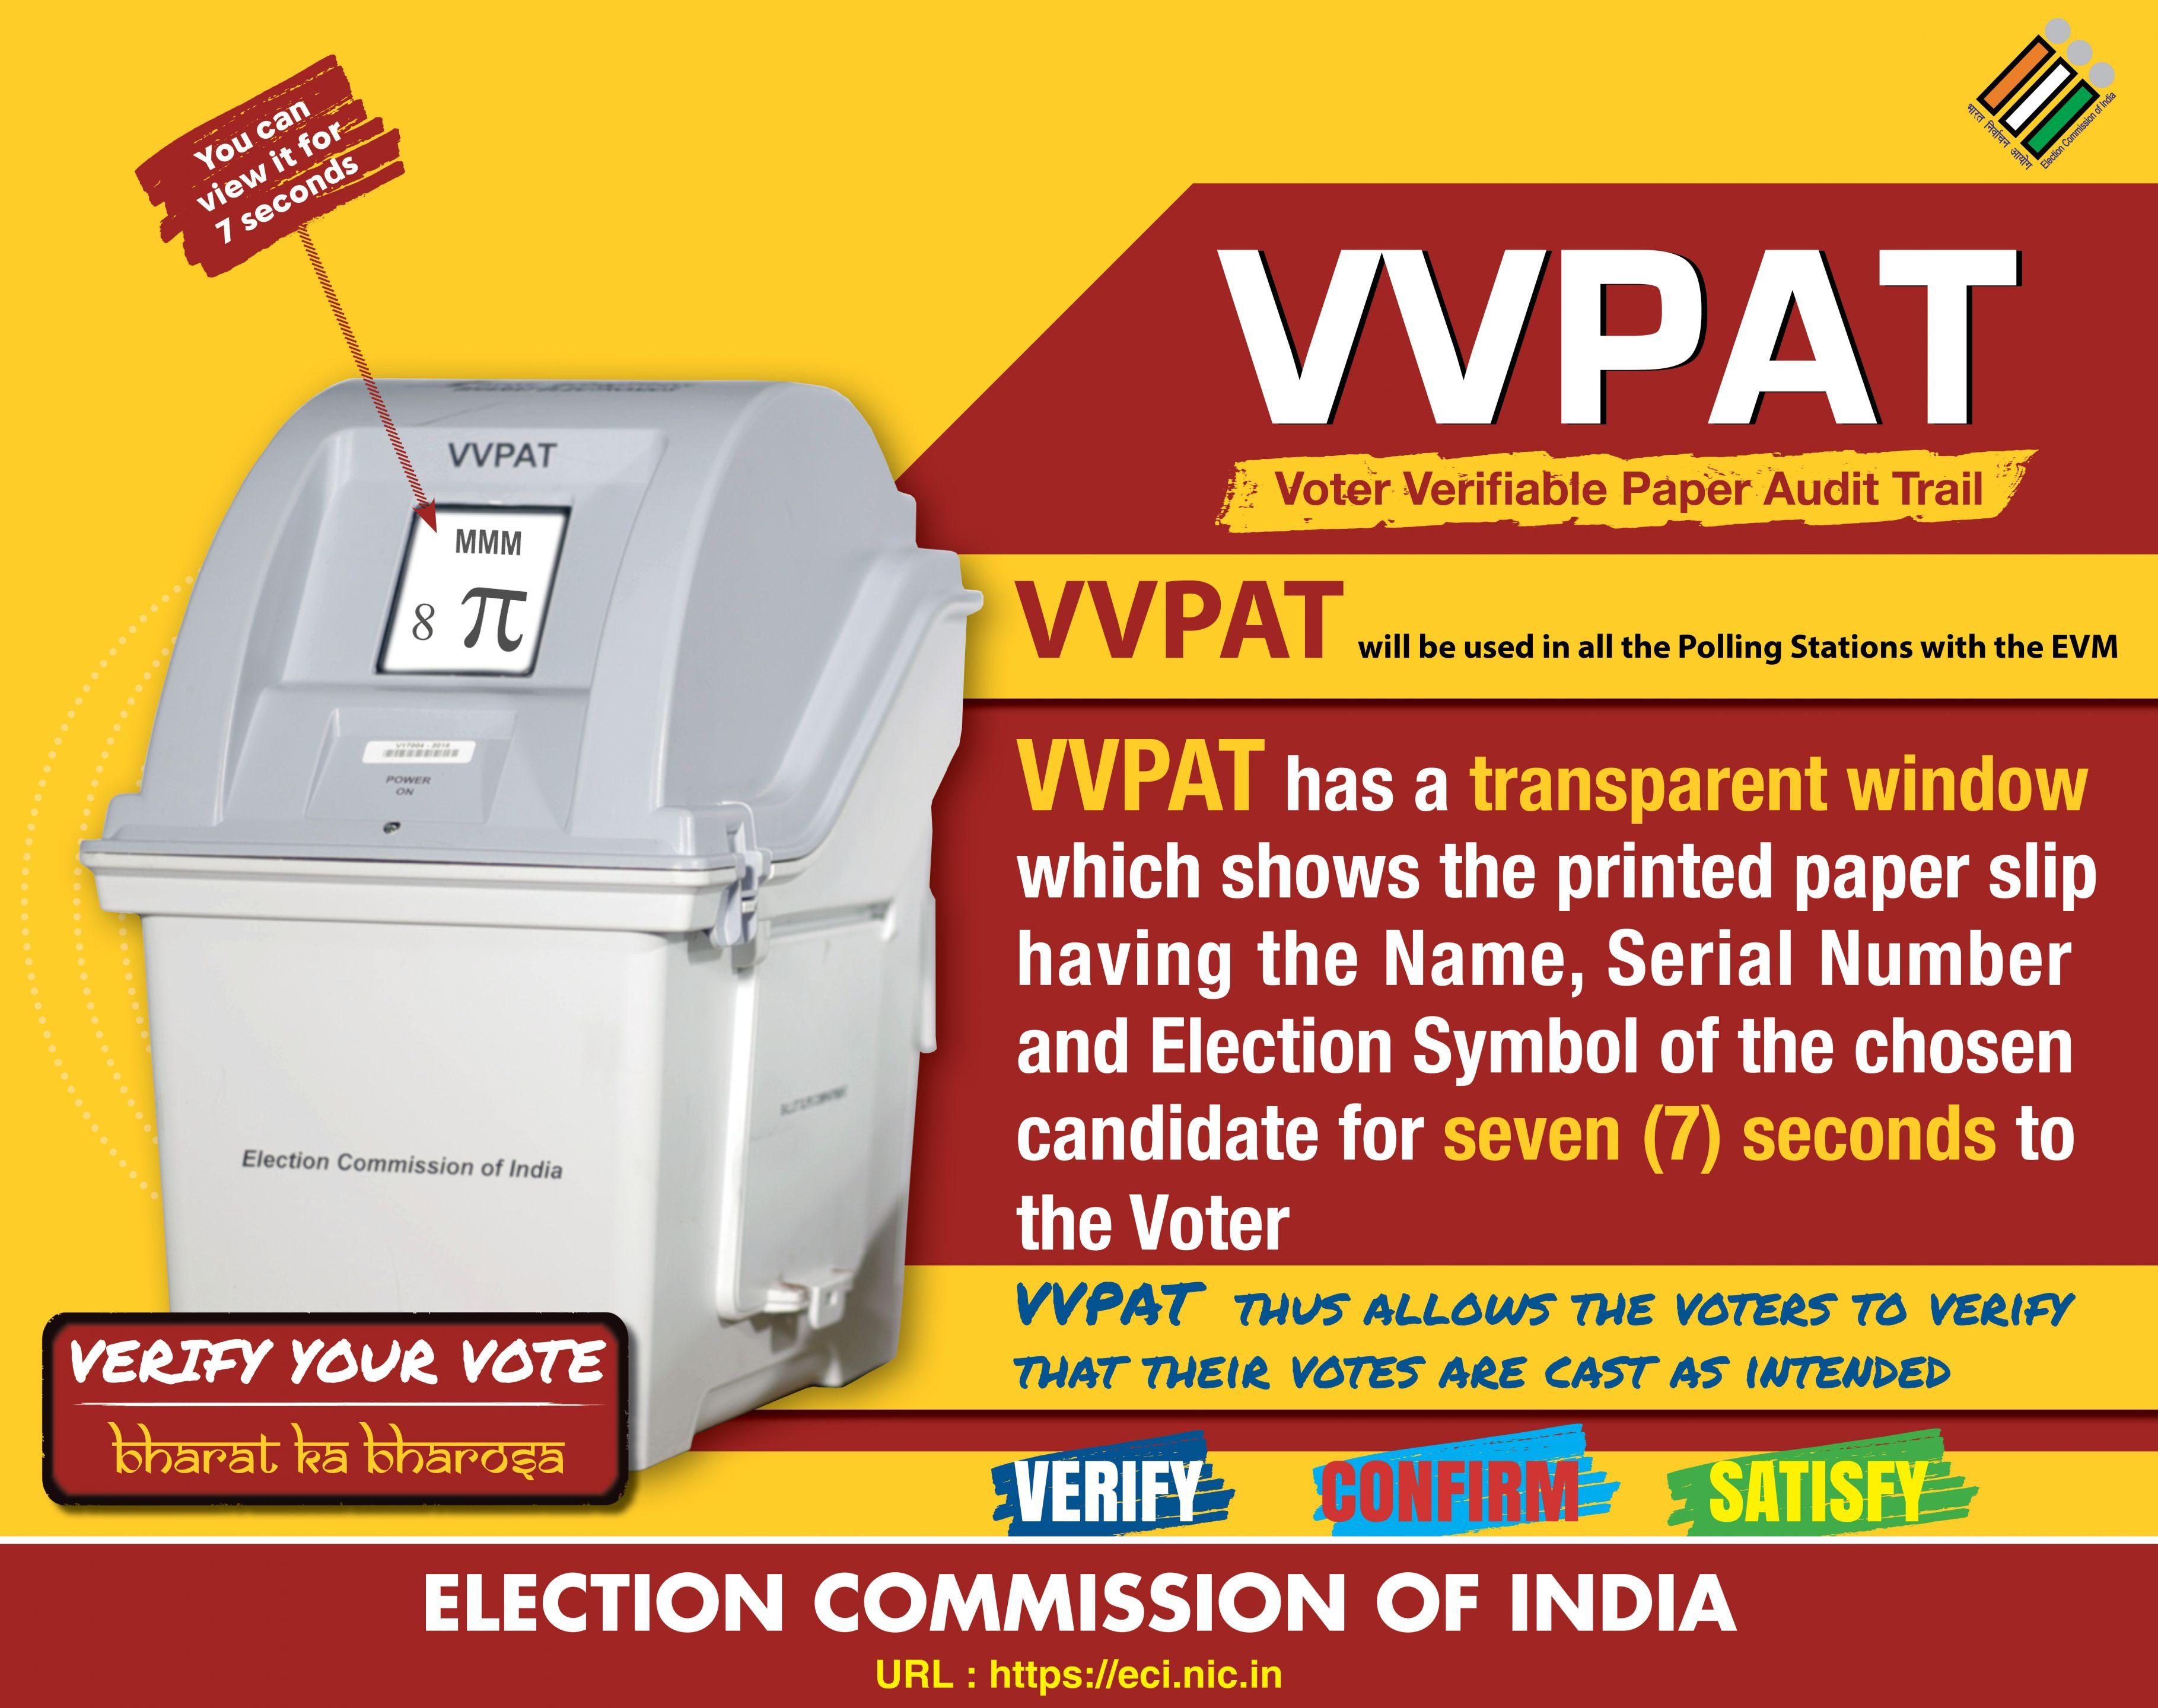 VVPAT Poster